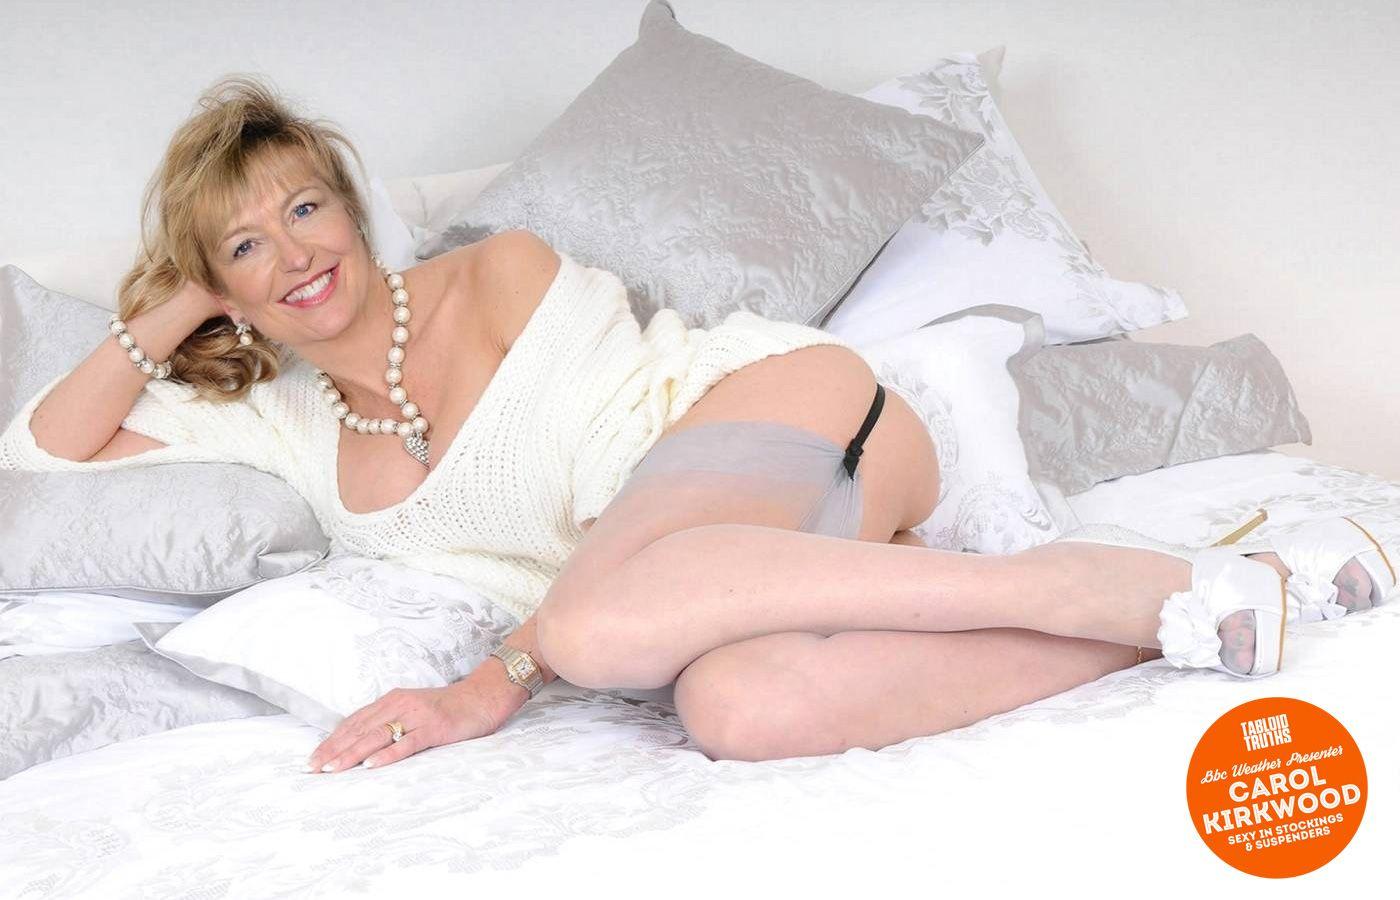 Hottest Female Celebrities Celebs Nylons Modern Women Bbc Weather Carol Kirkwood